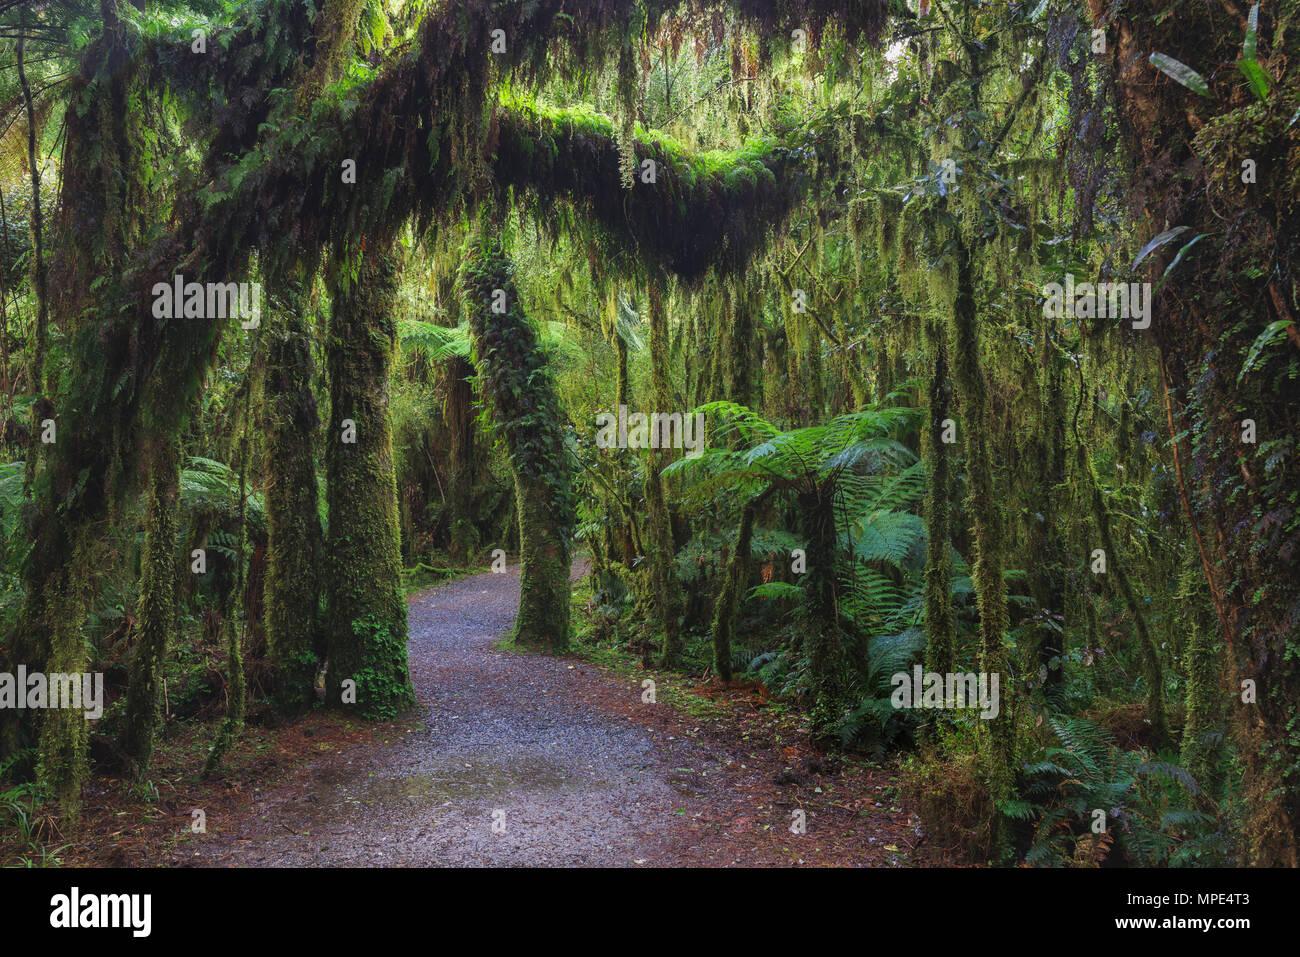 Neuseeland Regenwald details Landschaft Bild Stockbild